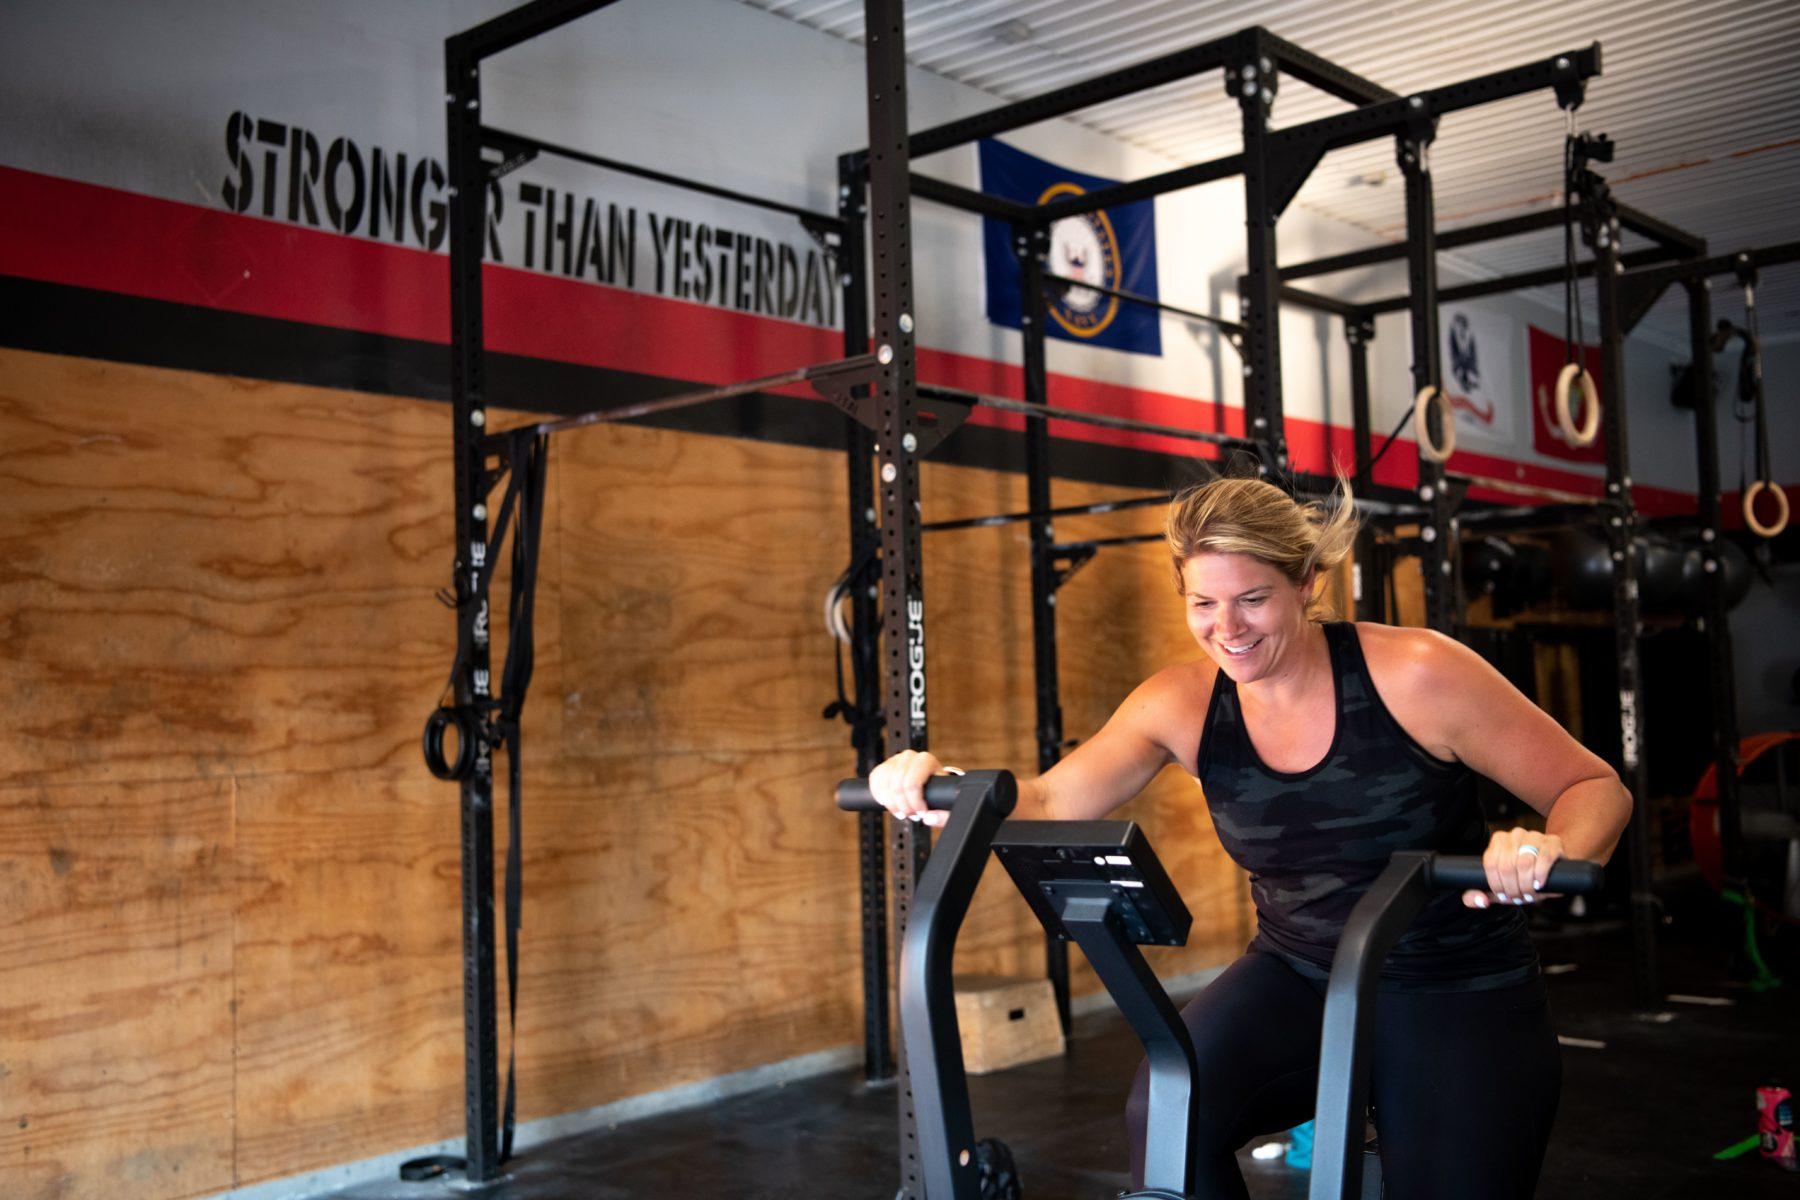 Kelly Rubincans success story